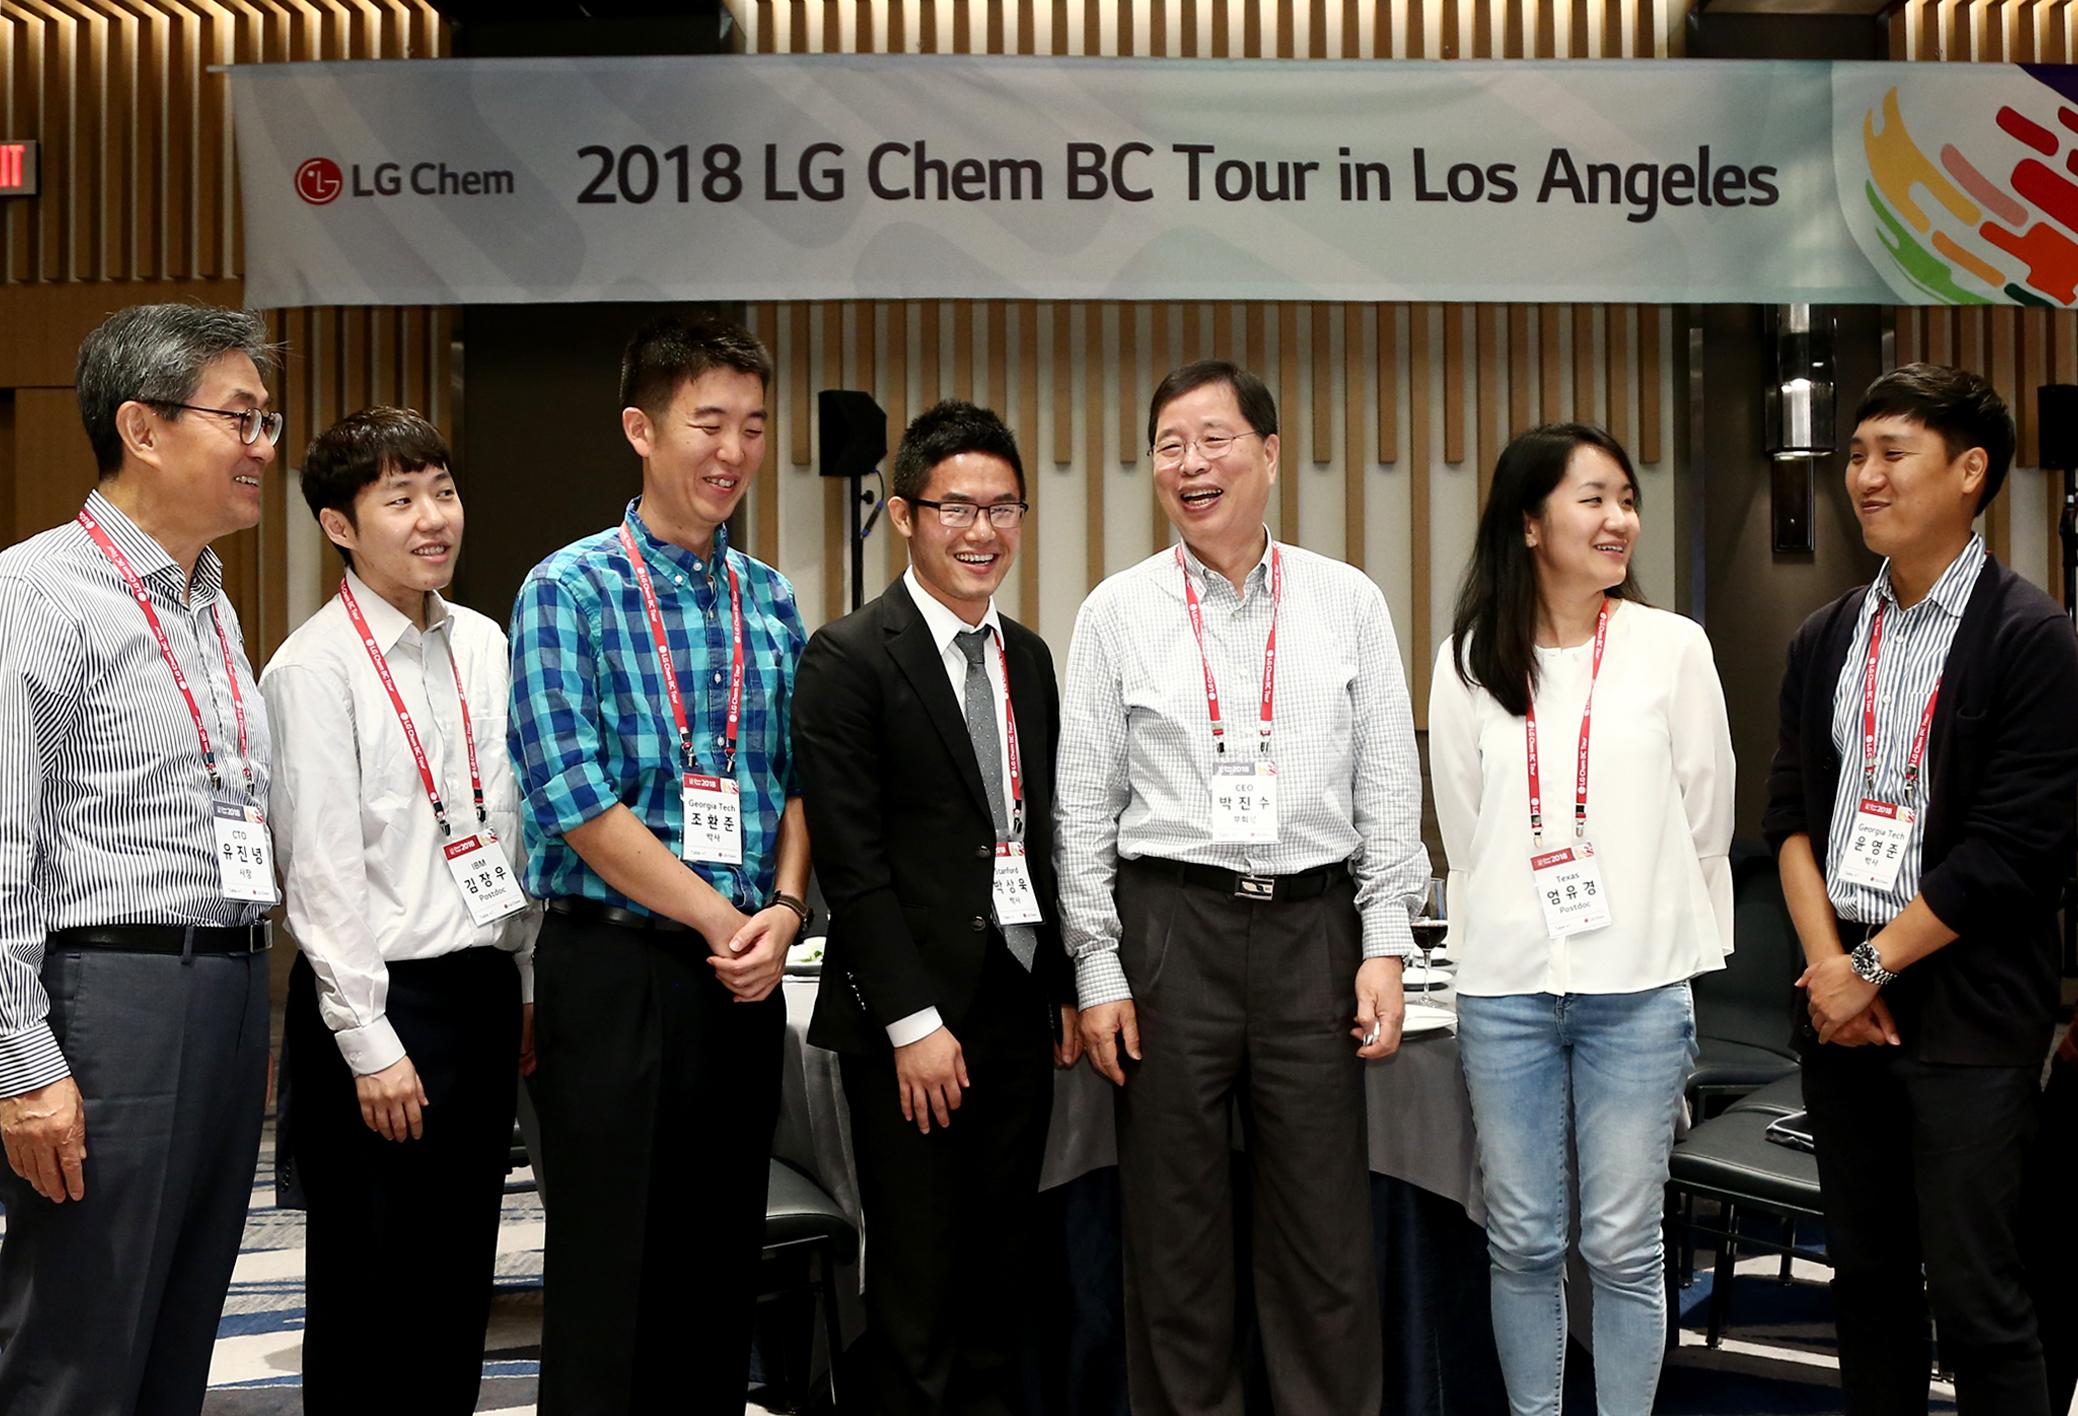 LG화학 CEO 박진수 부회장(오른쪽 세번째)과 CTO 유진녕 사장(왼쪽 첫번째)이 미국 LA에서 열린